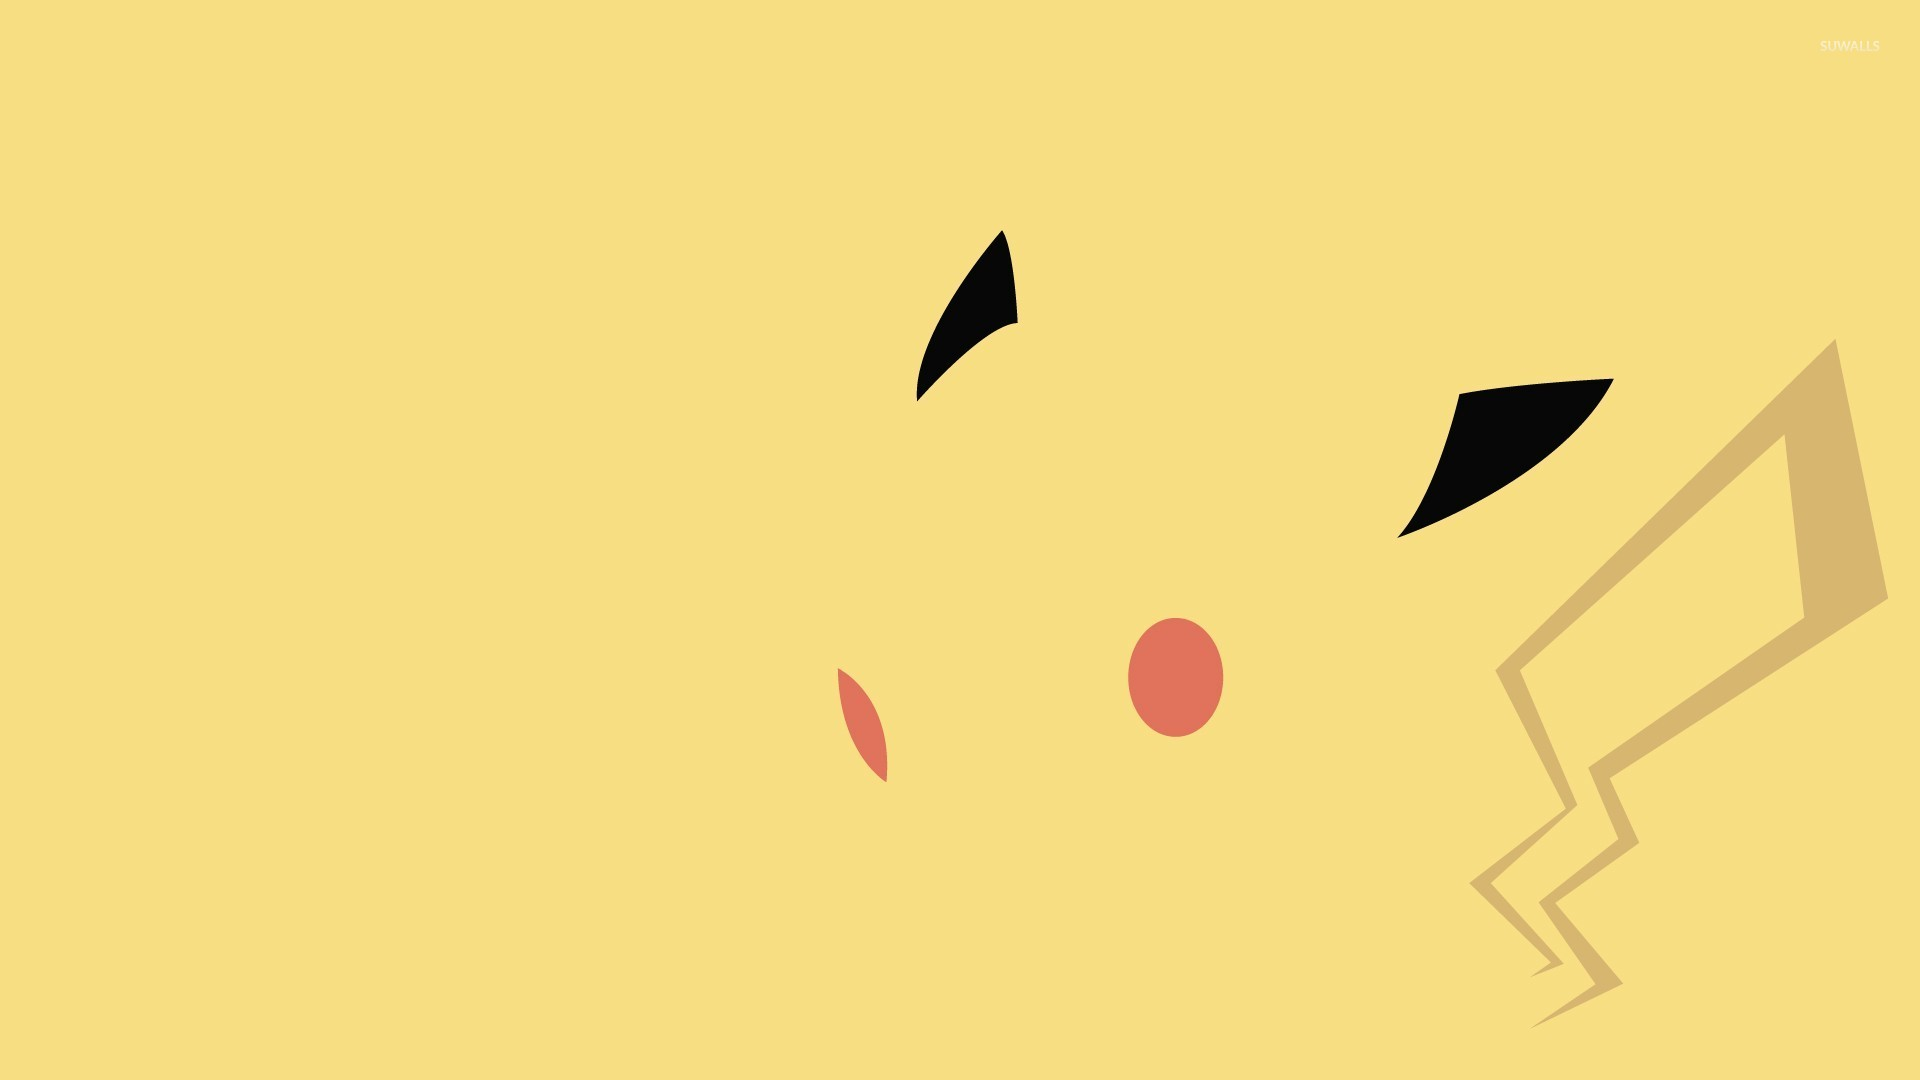 Game Of Thrones Quotes Desktop Wallpaper Pikachu Pokemon 3 Wallpaper Minimalistic Wallpapers